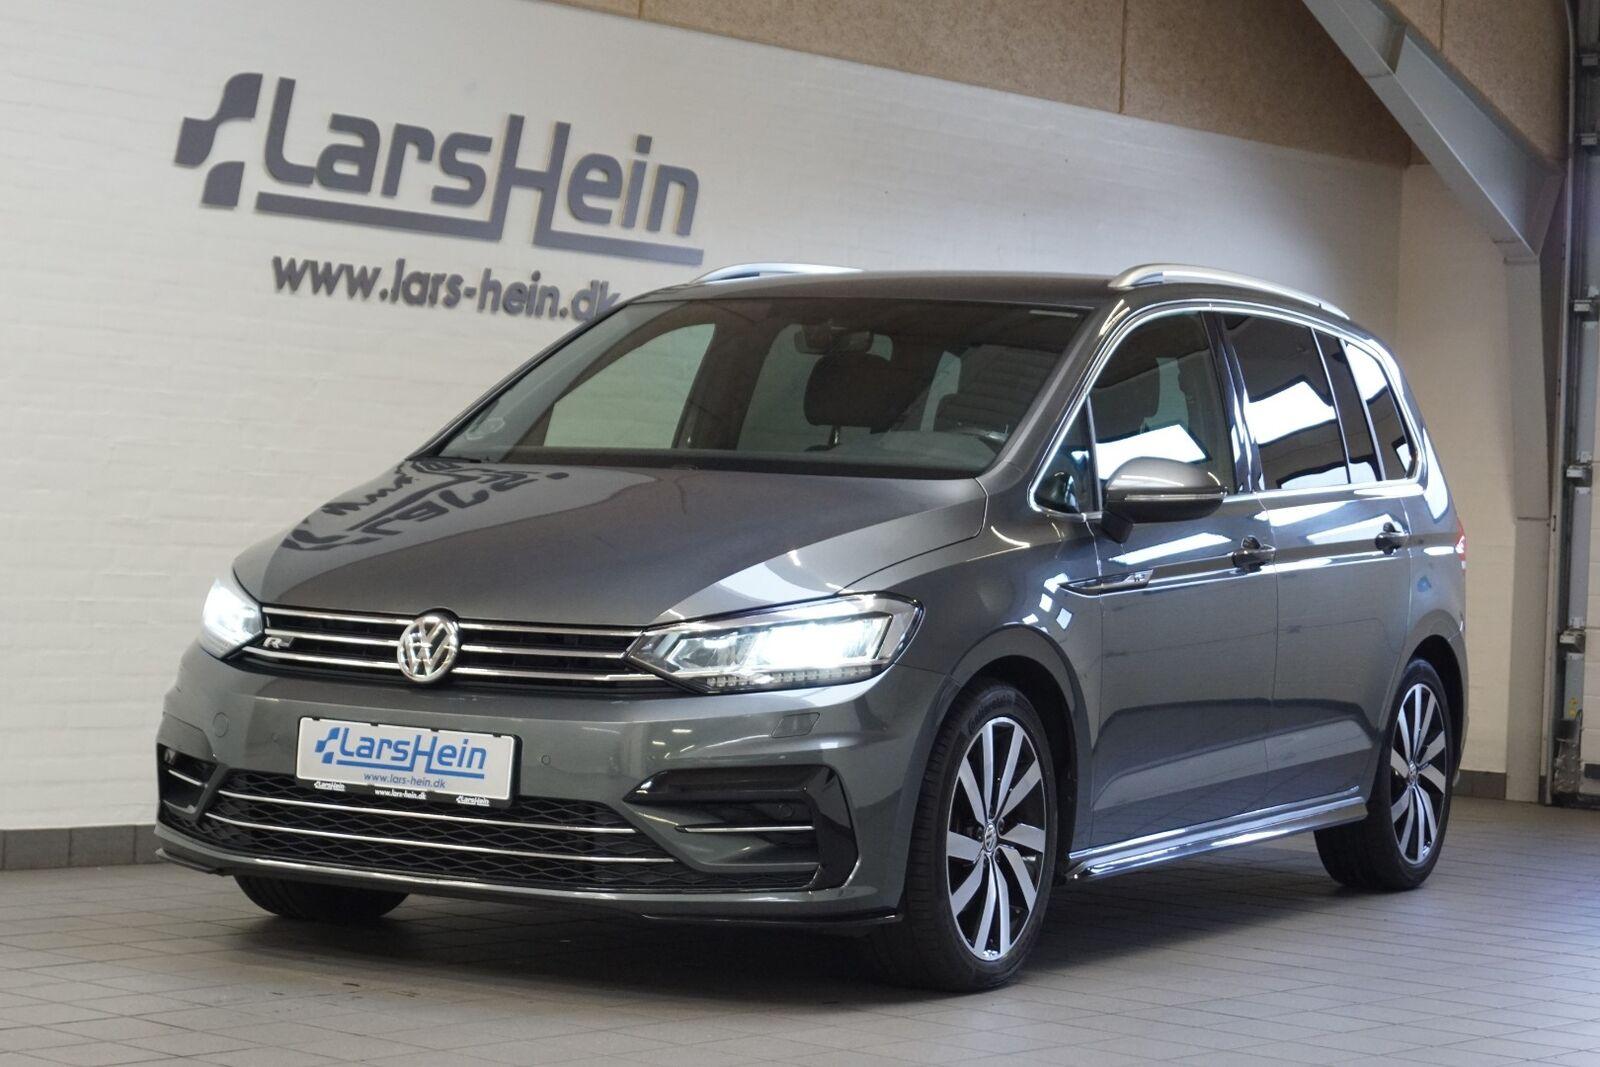 VW Touran 2,0 TDi 150 R-line DSG 7prs 5d - 339.800 kr.